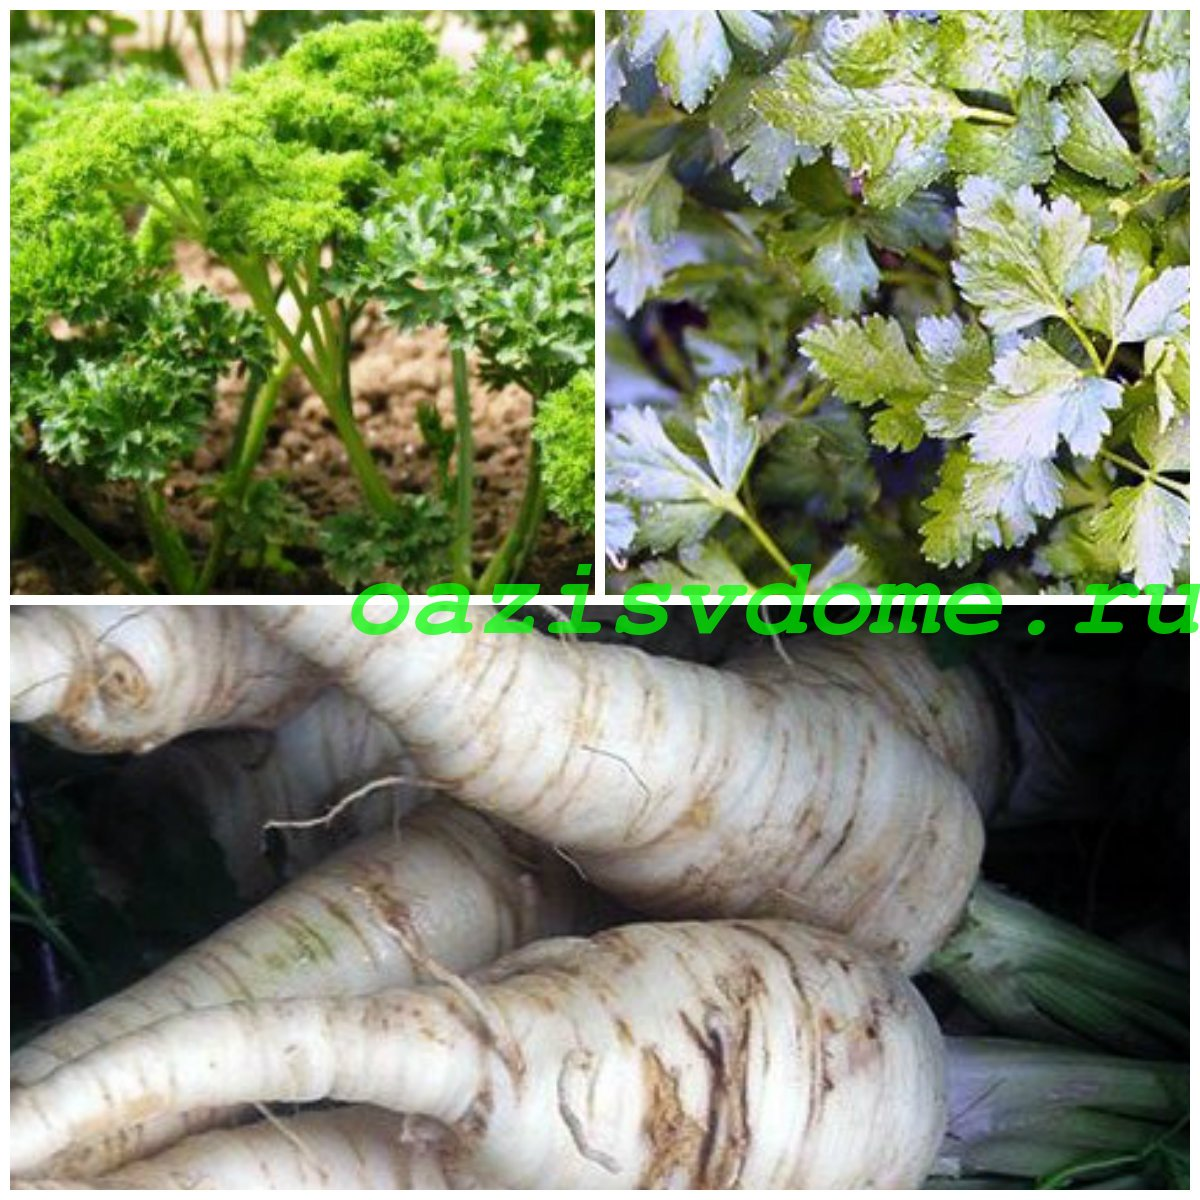 Петрушка: выращивание из семян в открытом грунте и на подоконнике